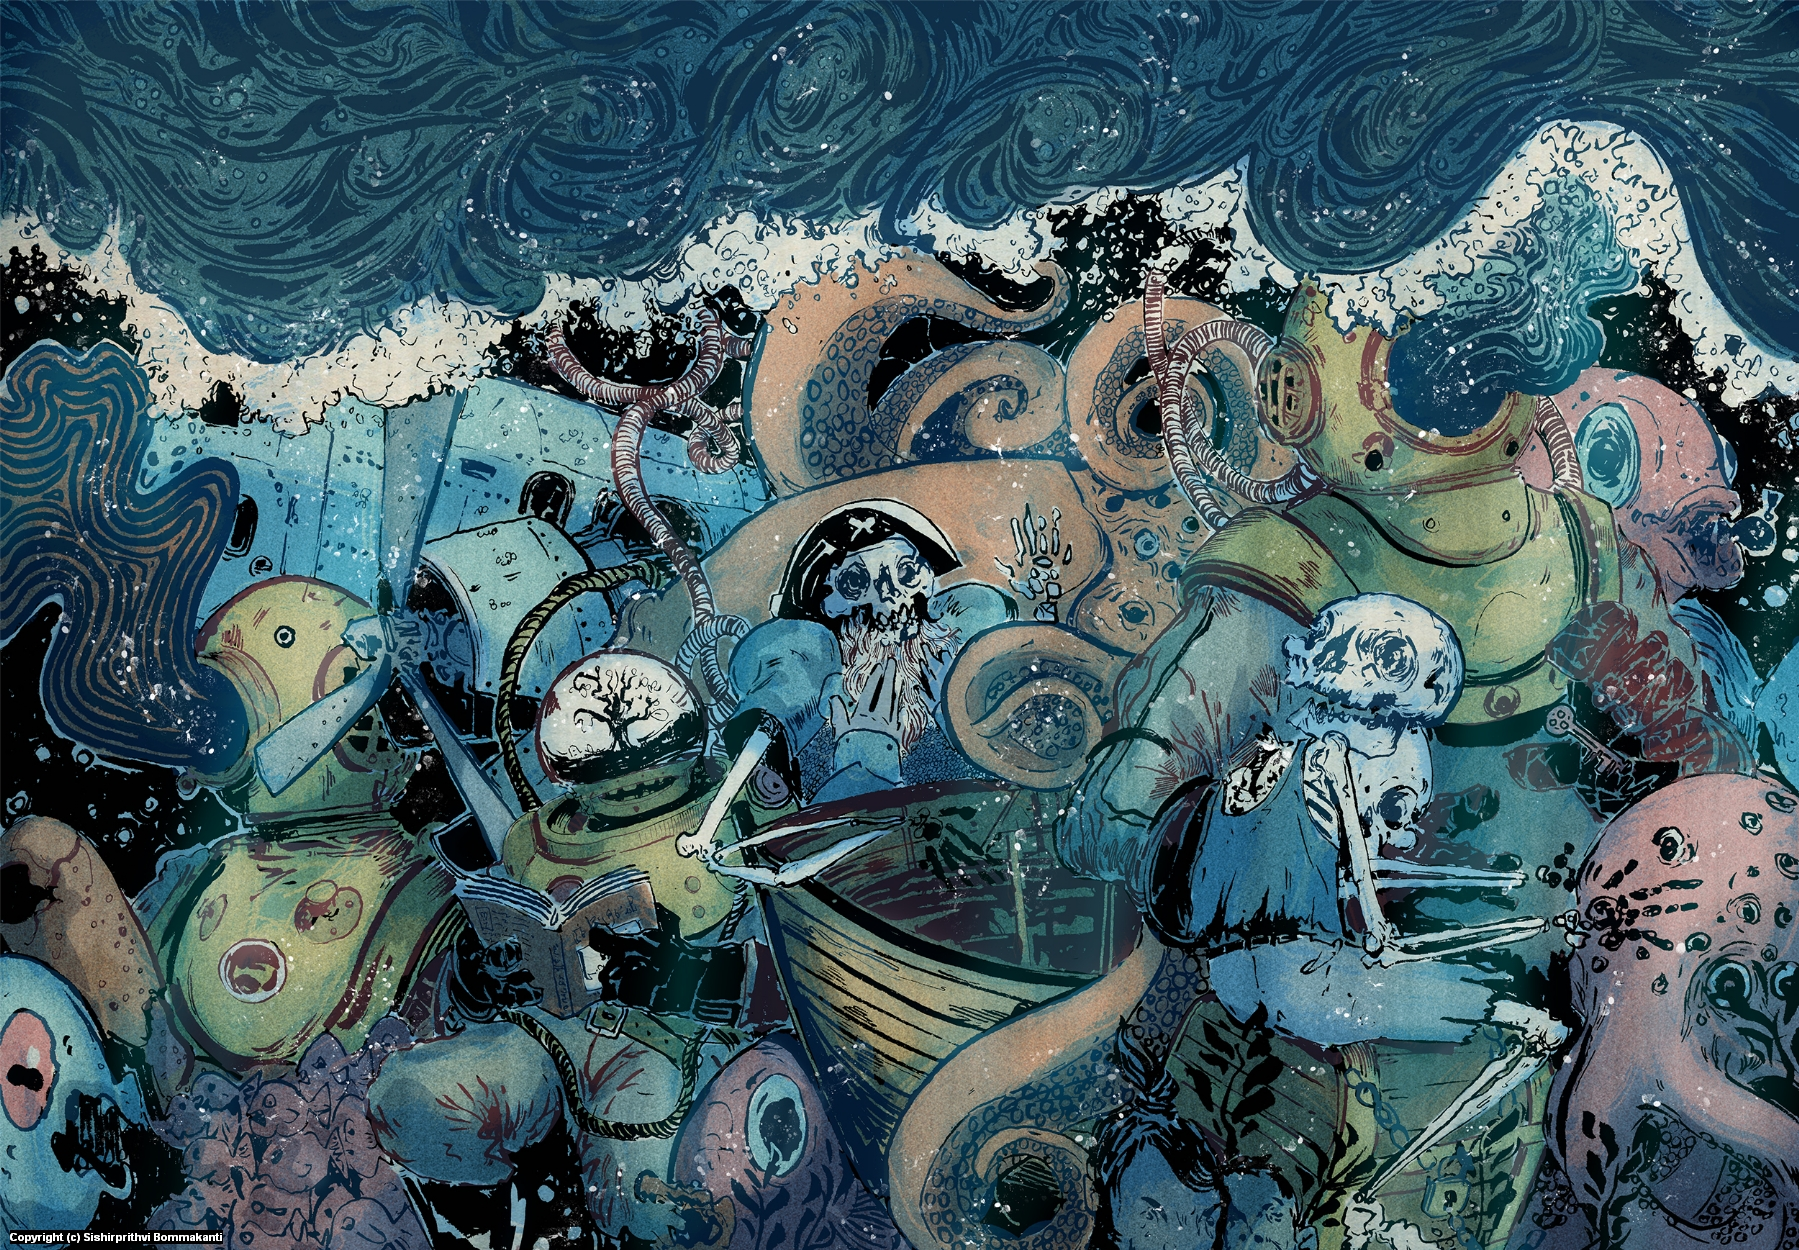 Seabed Empire  Artwork by Sishirprithvi Bommakanti